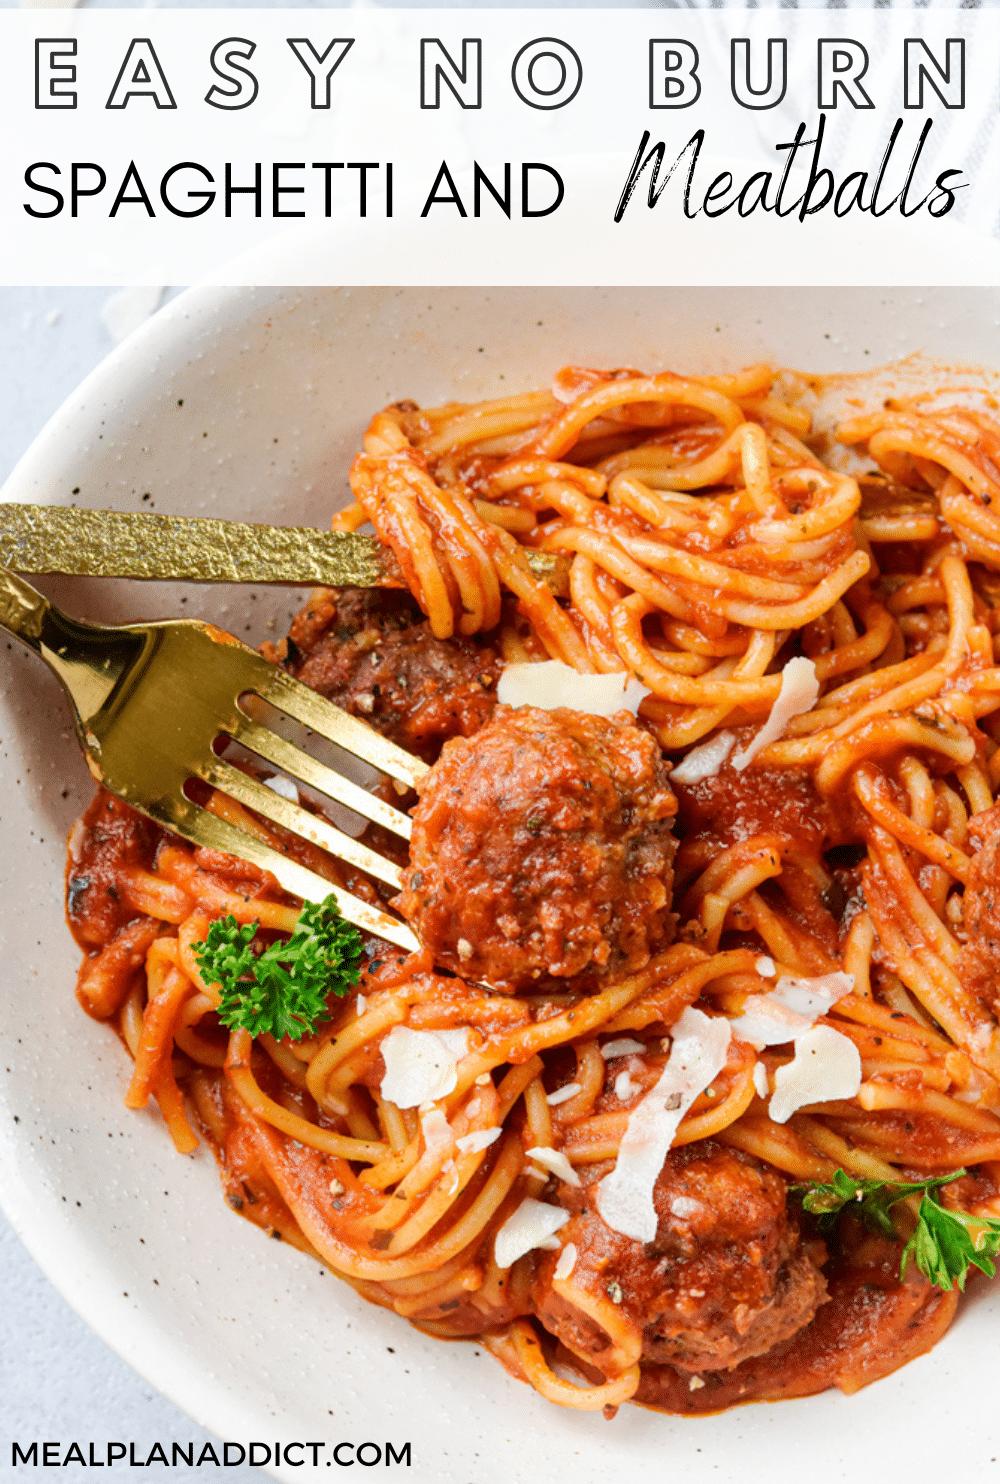 Spaghetti pin for Pinterest